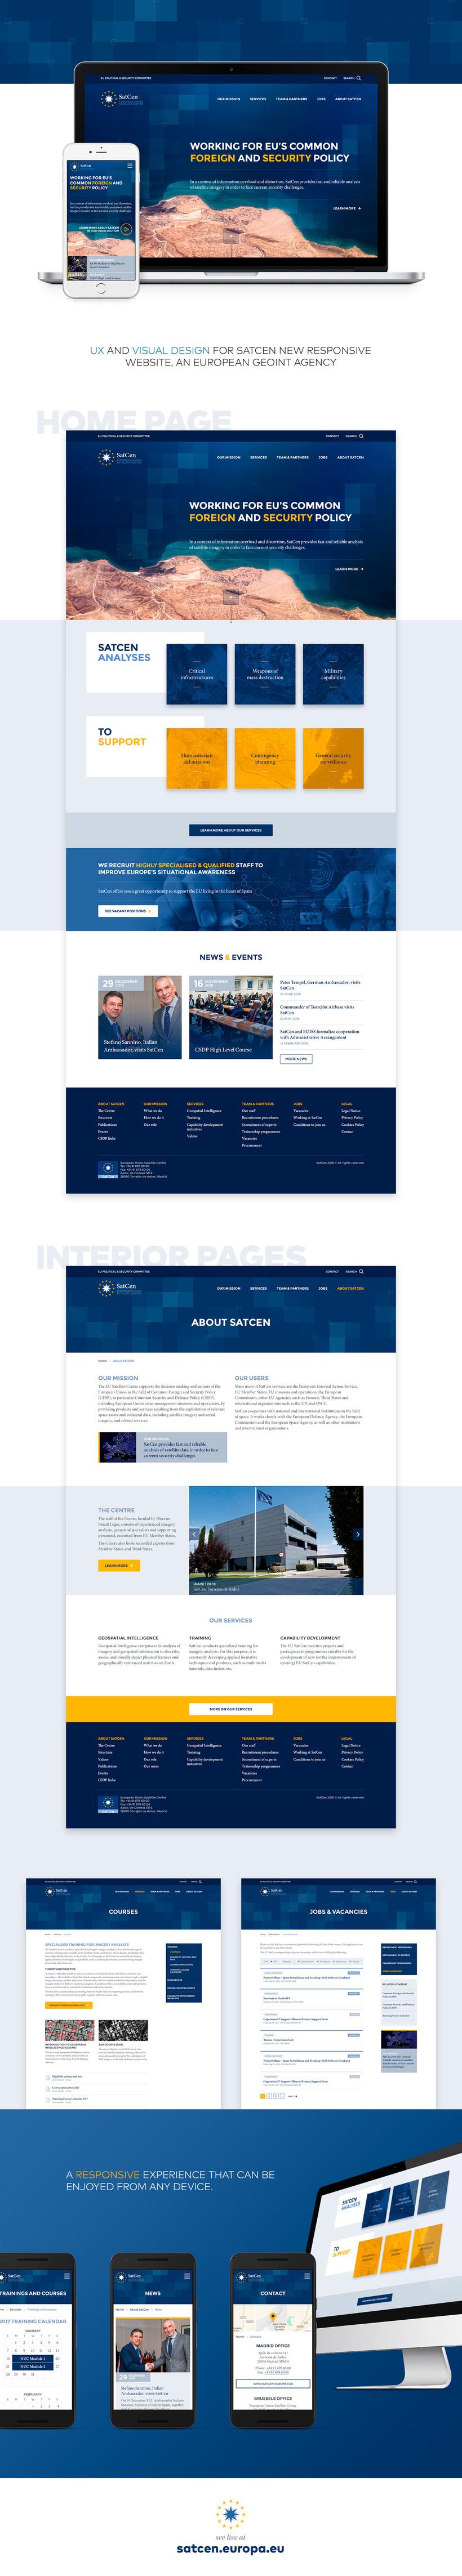 SatCen - European Union Satellite Centre 0